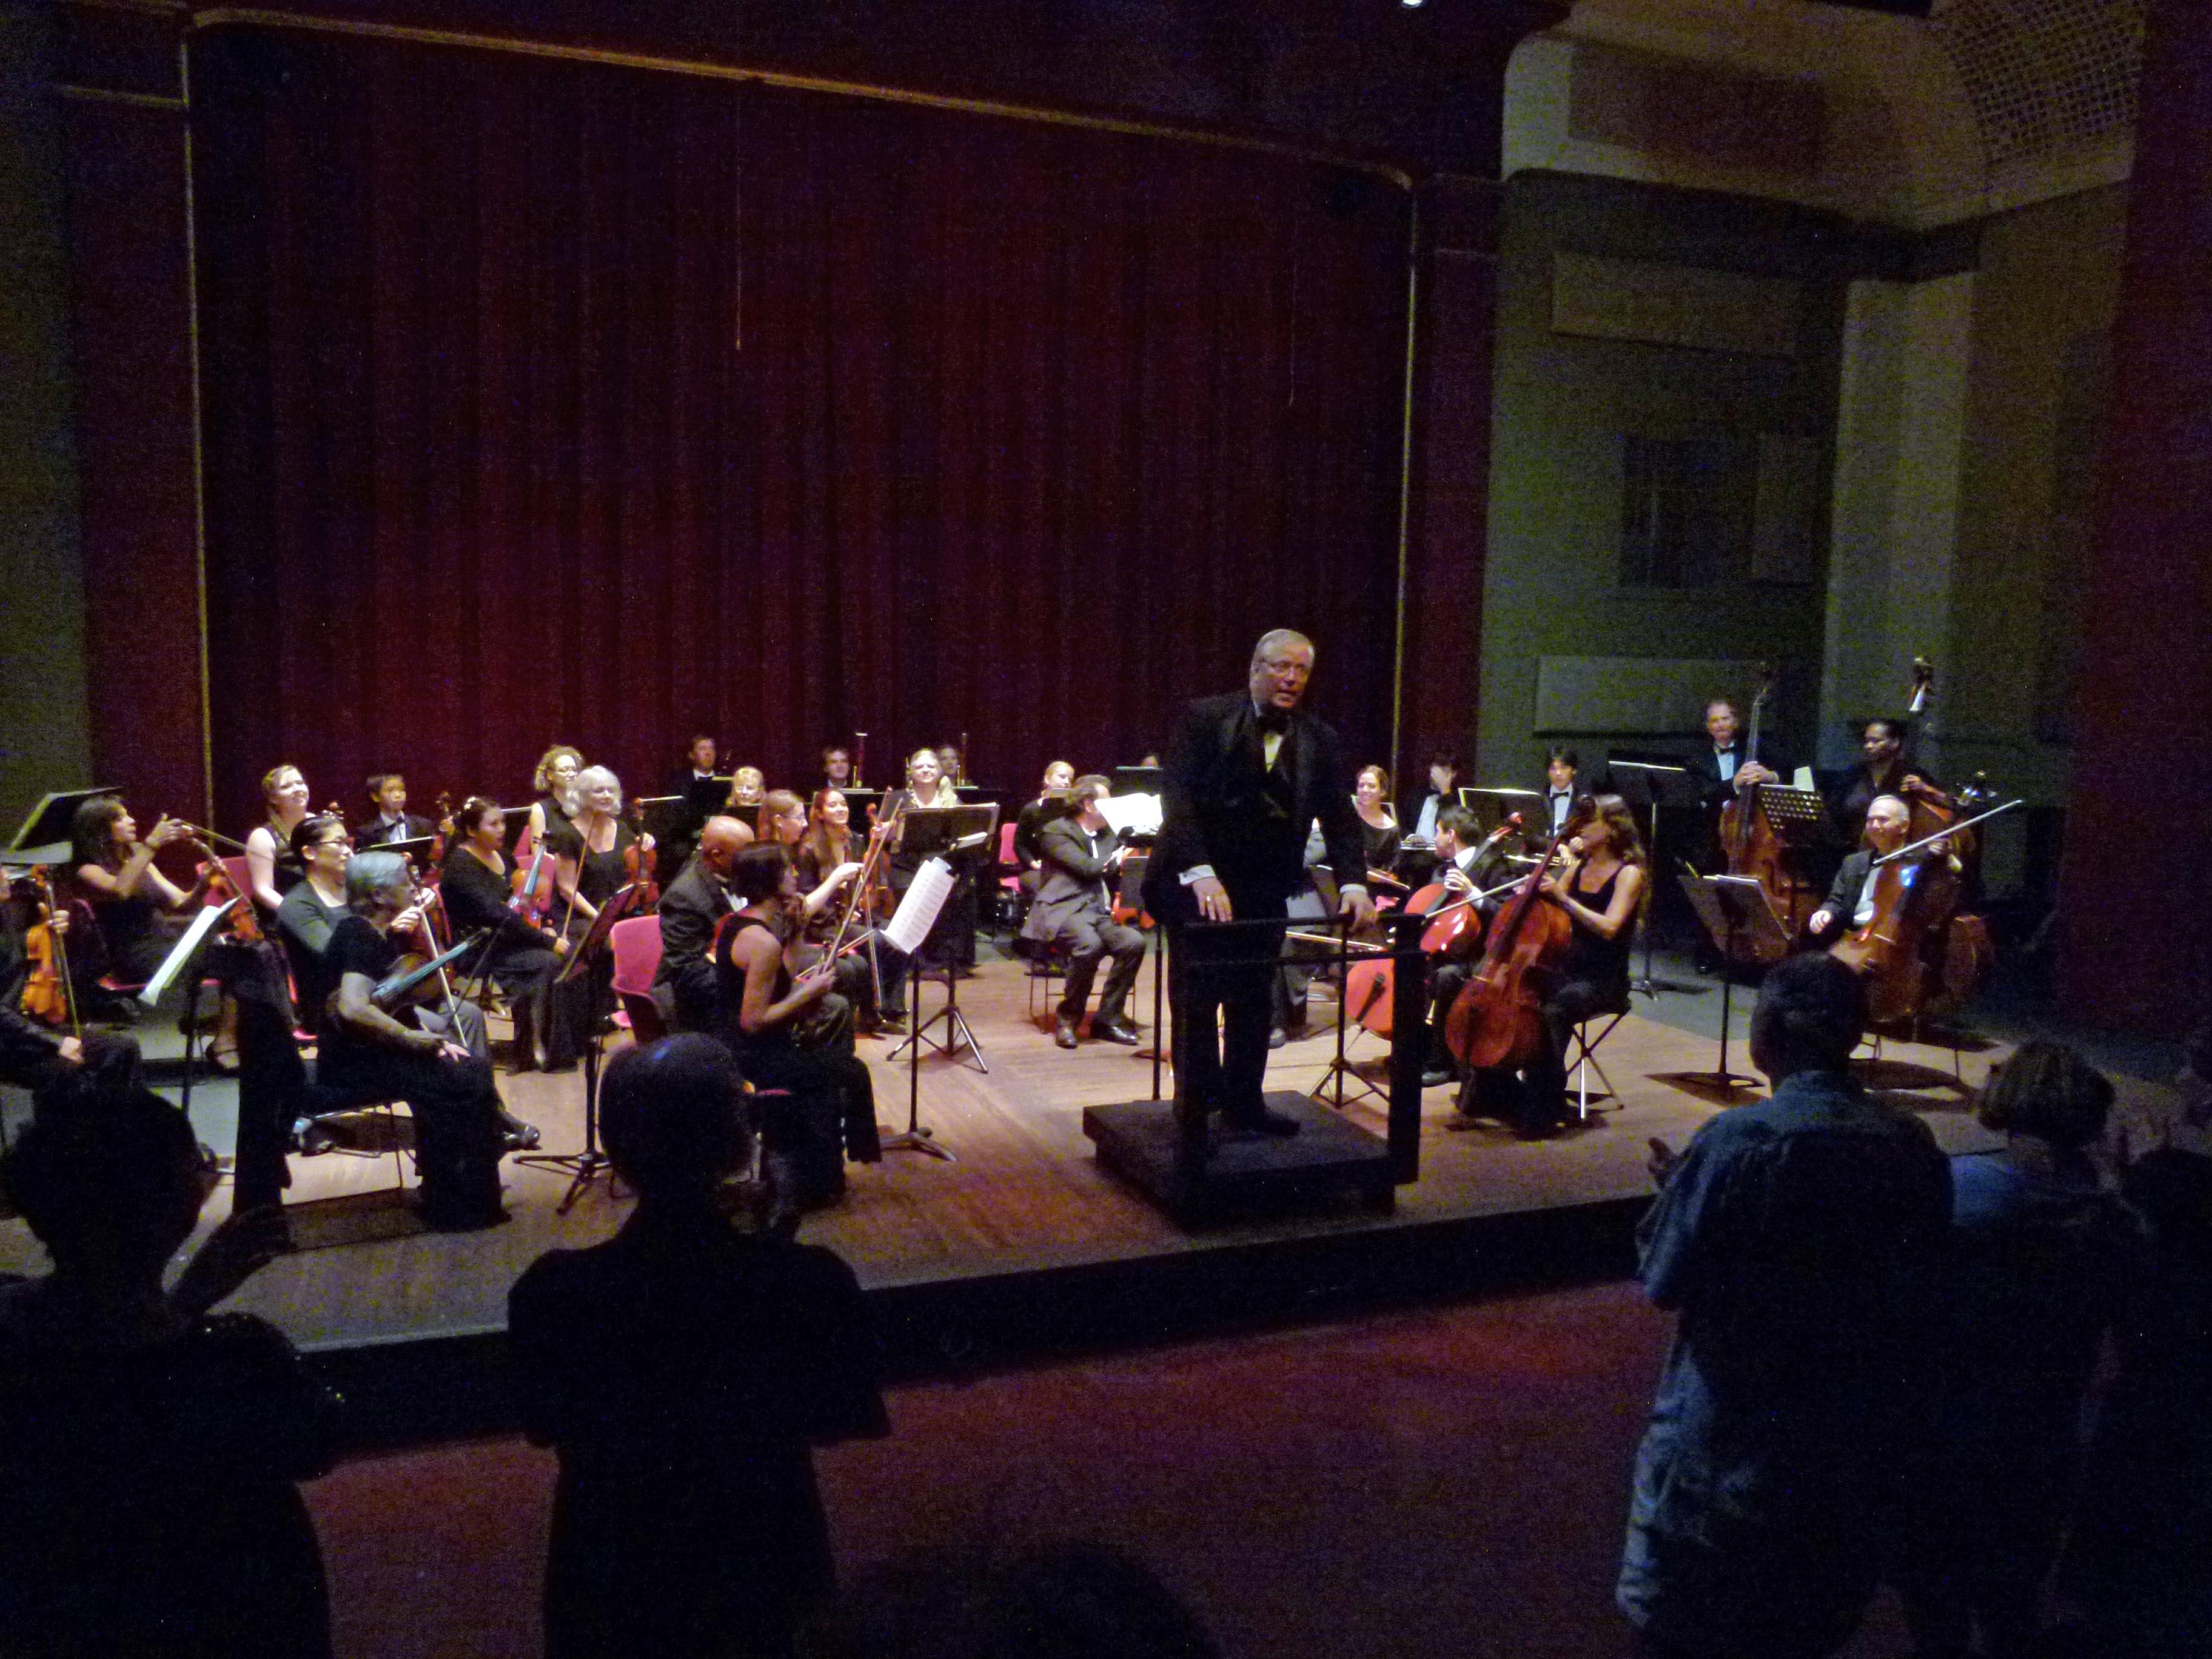 Maui Chamber Orchestra director. Maestro Robert E. Wills. Paul Janes-Brown photo.